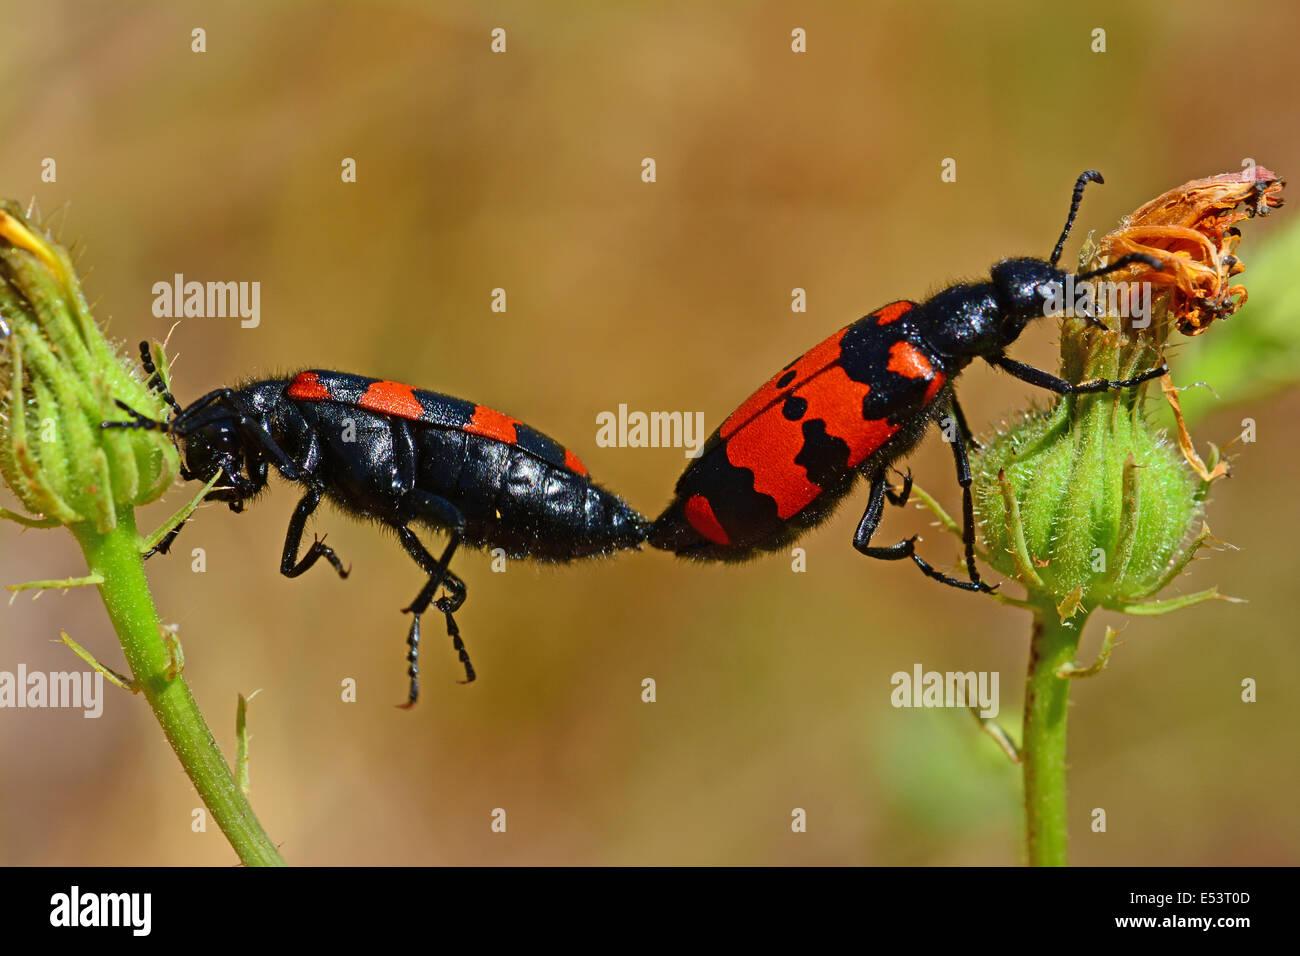 Käfer, Paarung, Tierverhalten Stockfoto